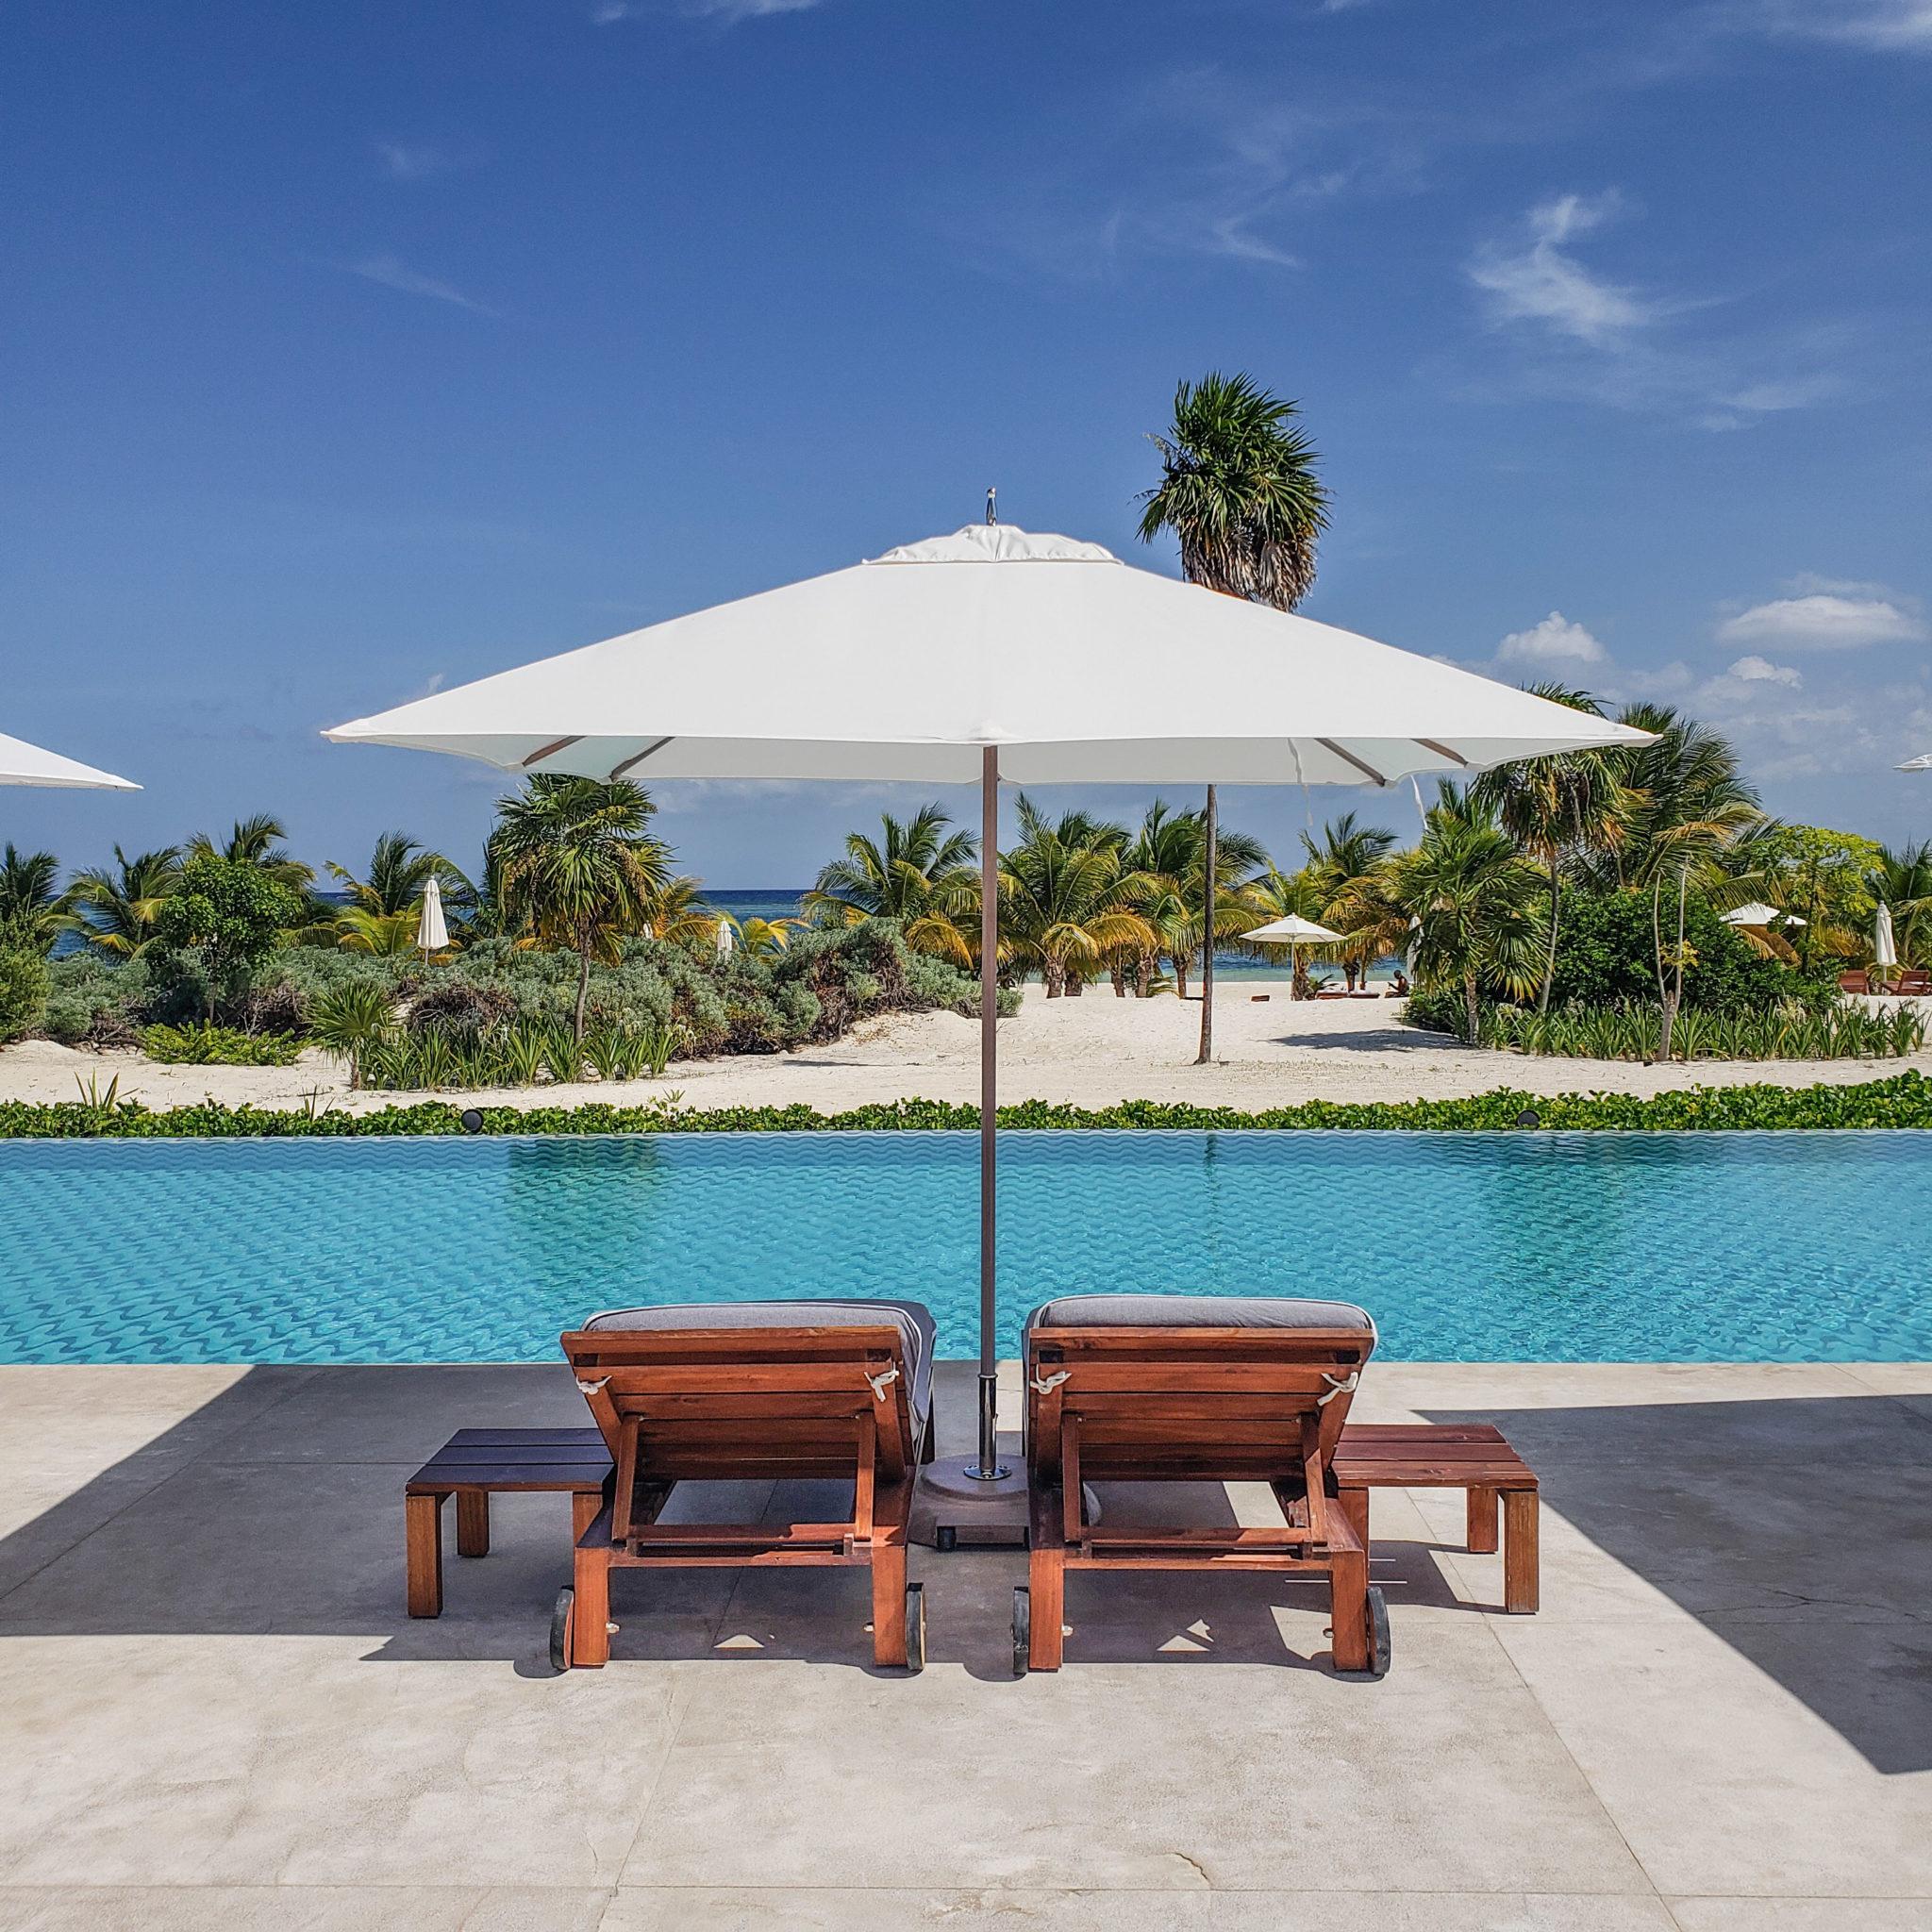 Chable Maroma Resort - Quintana Roo - Playa Del Carmen - Playa Maroma - Pool View